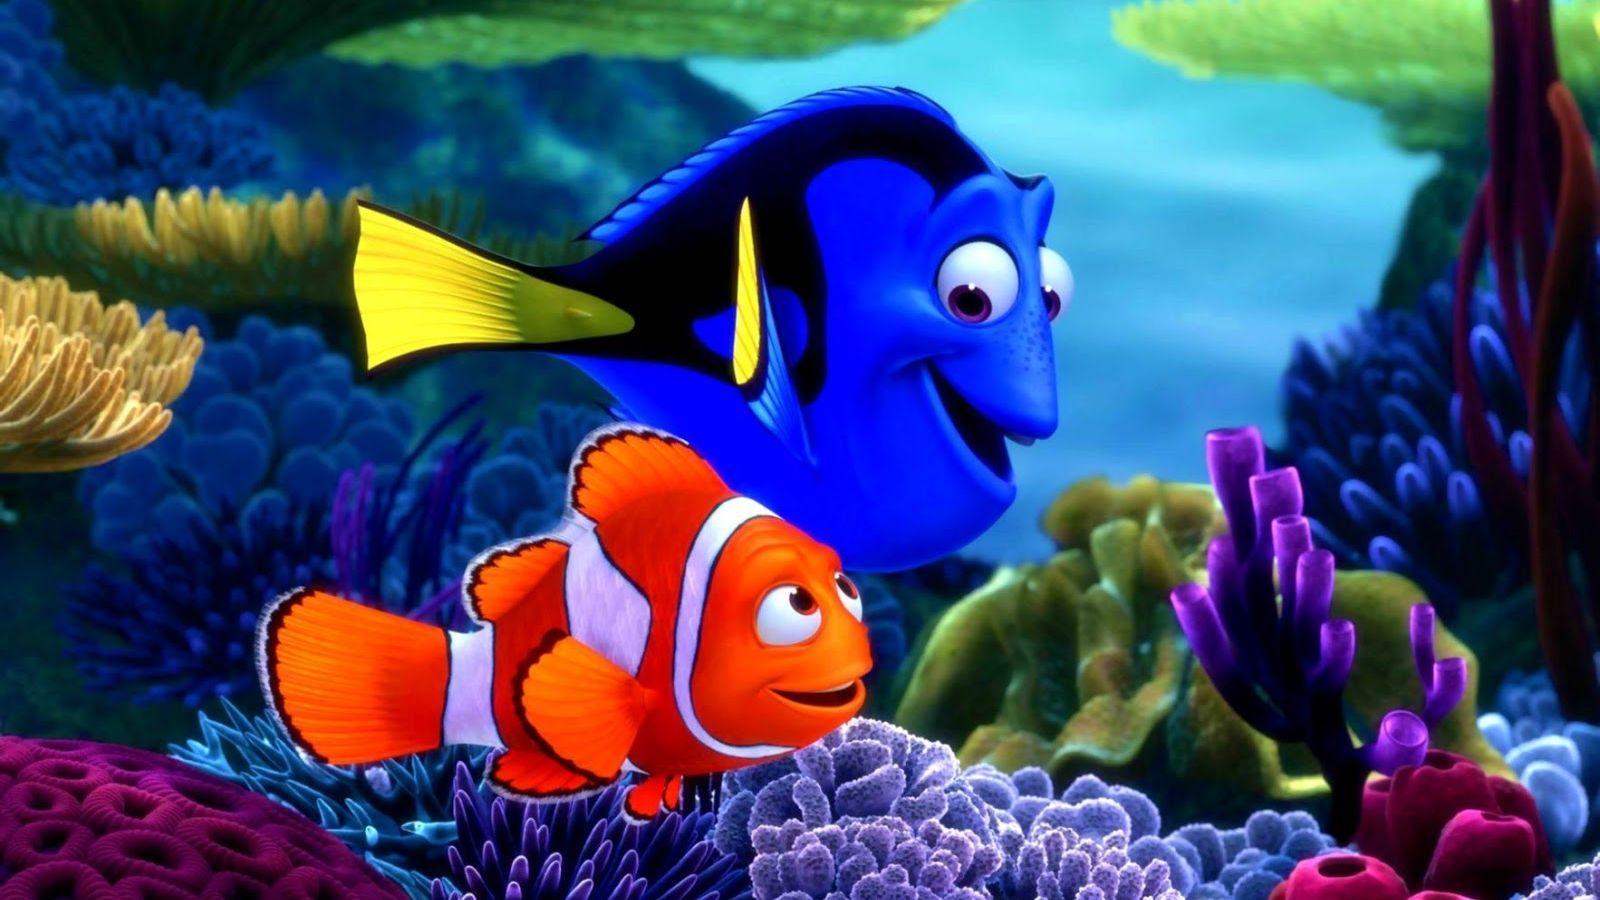 3d Fish Desktop Wallpapers Top Free 3d Fish Desktop Backgrounds Wallpaperaccess